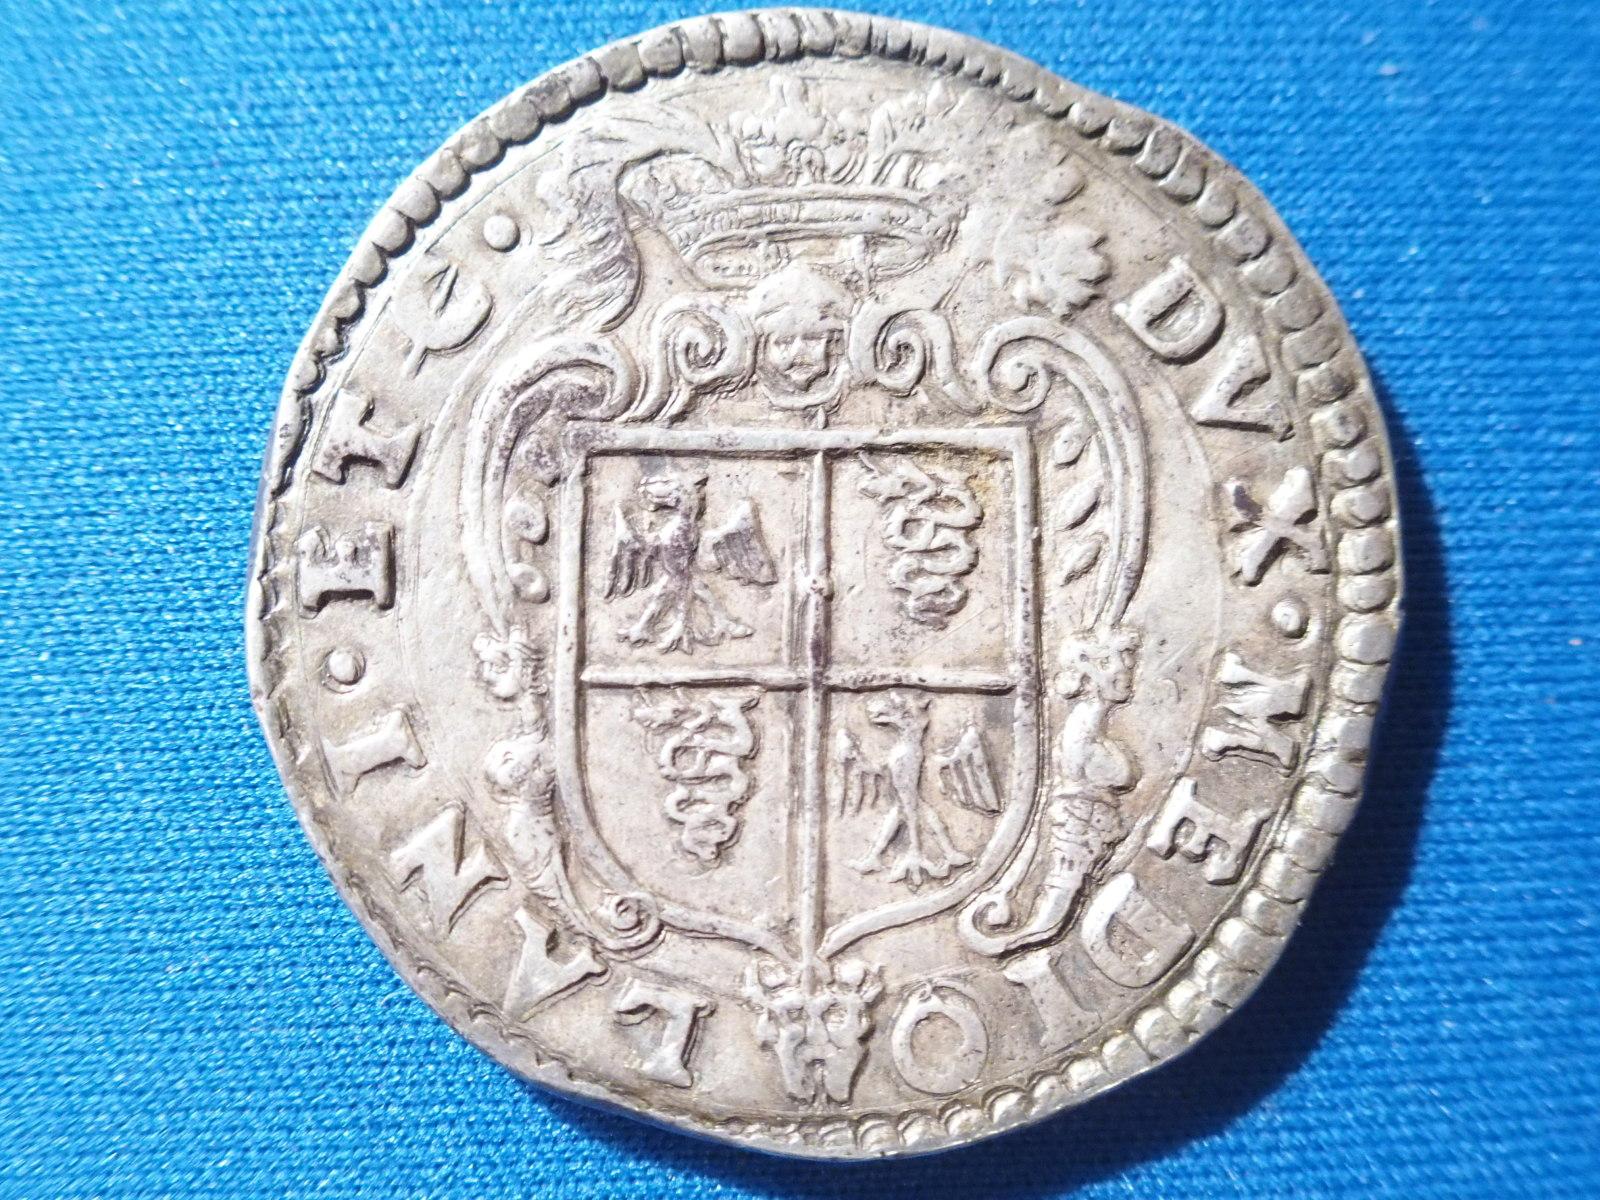 Escudo Felipe II Milan 1582 2i9atl